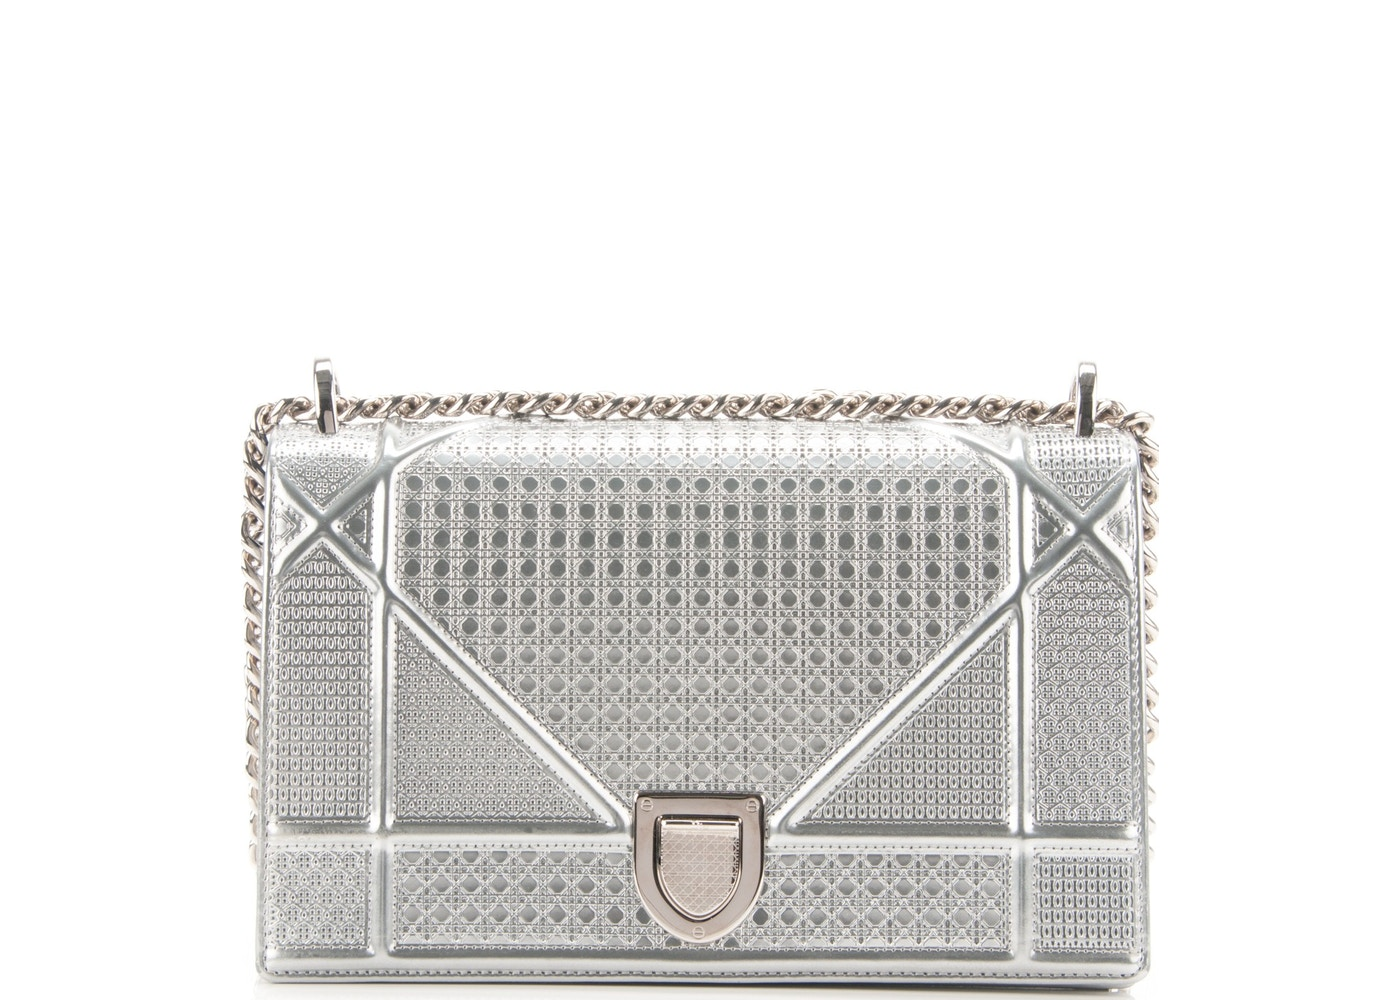 Dior - Highest Bid c64b39f6d1